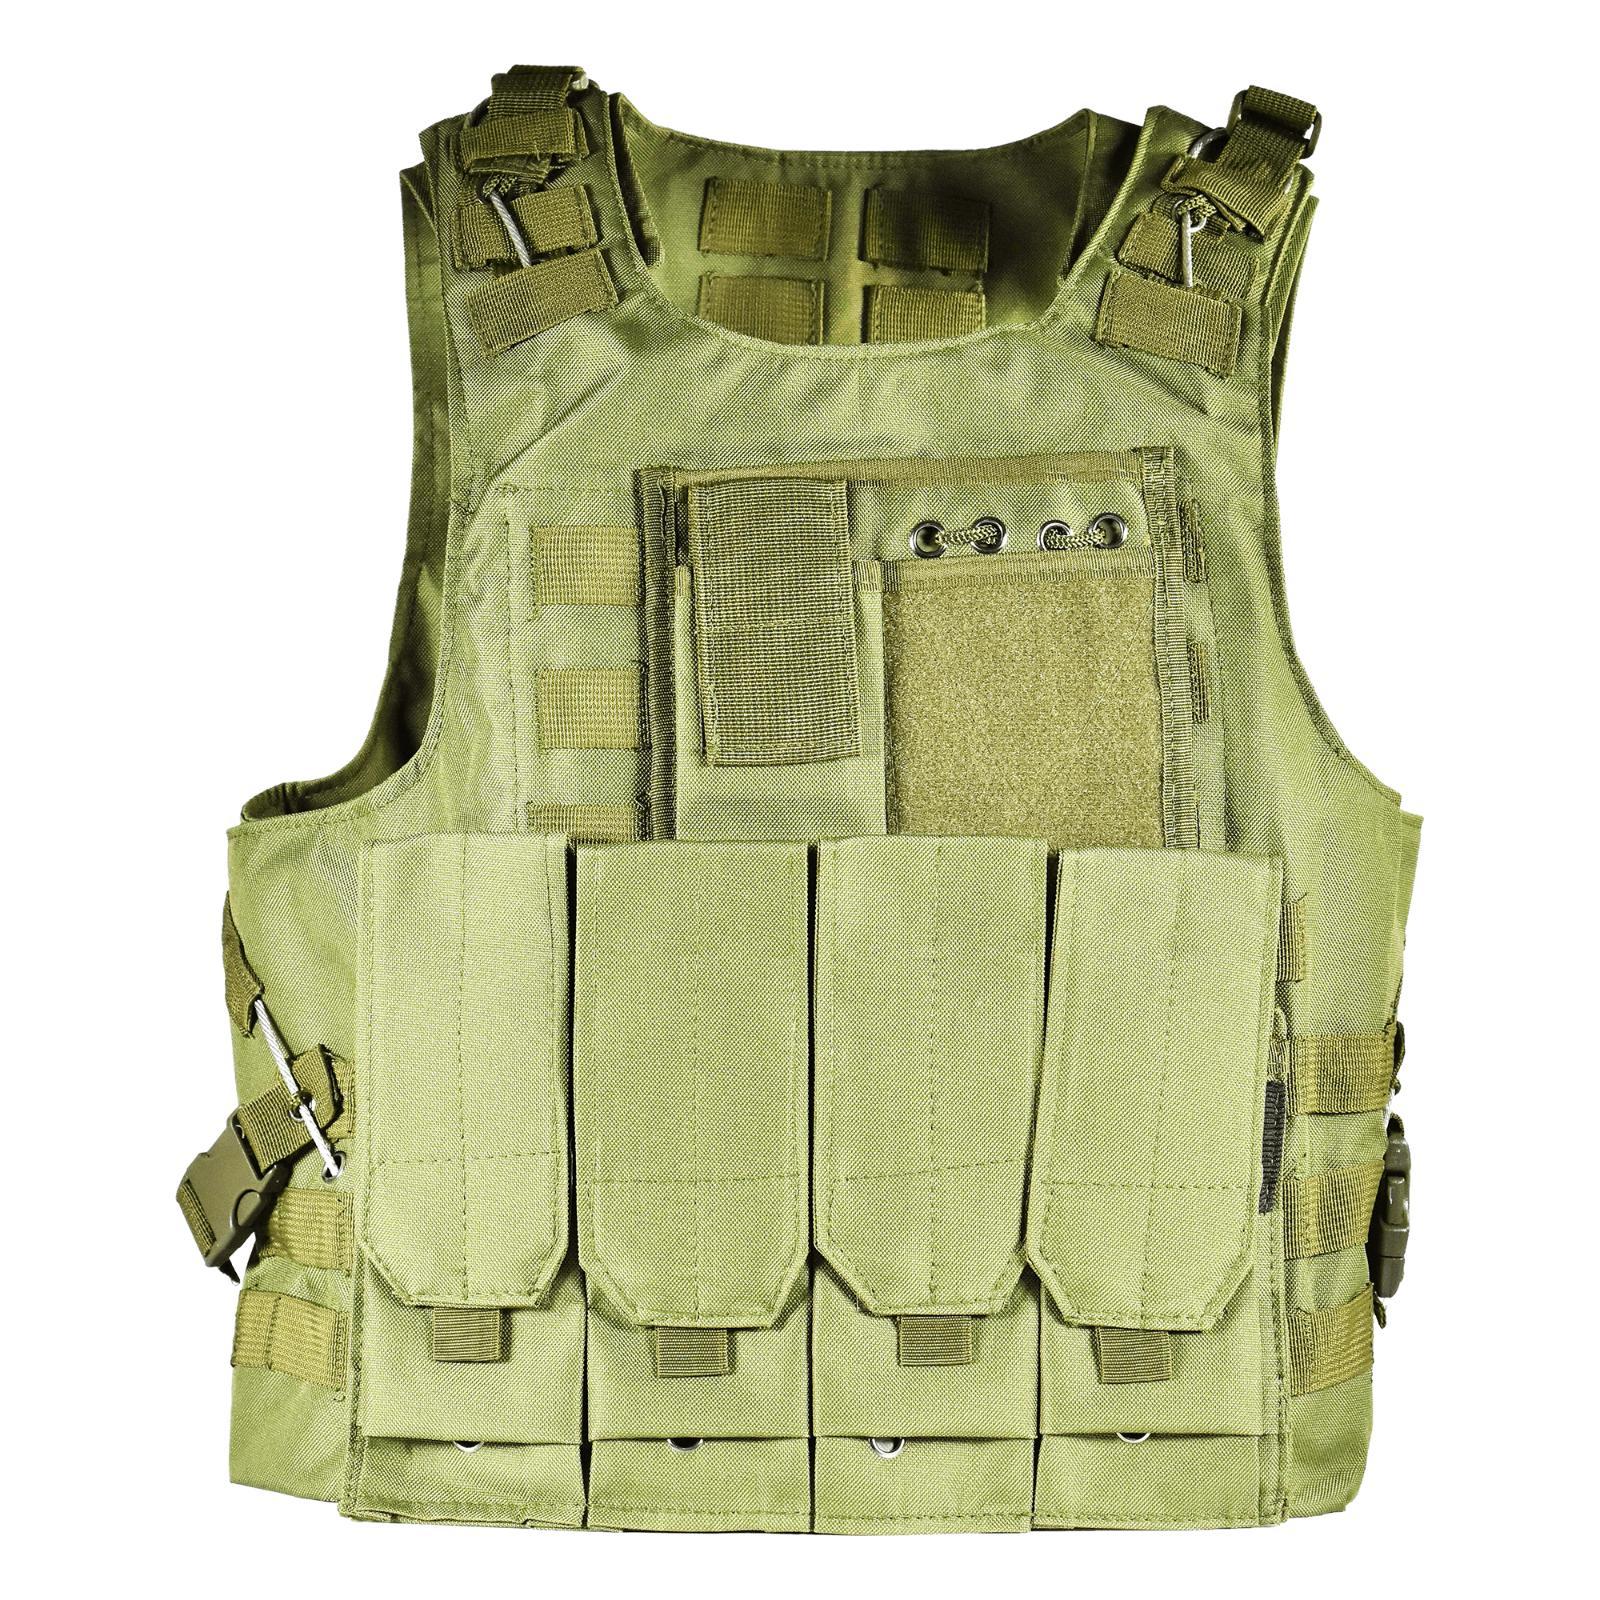 UltraGuards Paintball MOLLE Combat Play Vest